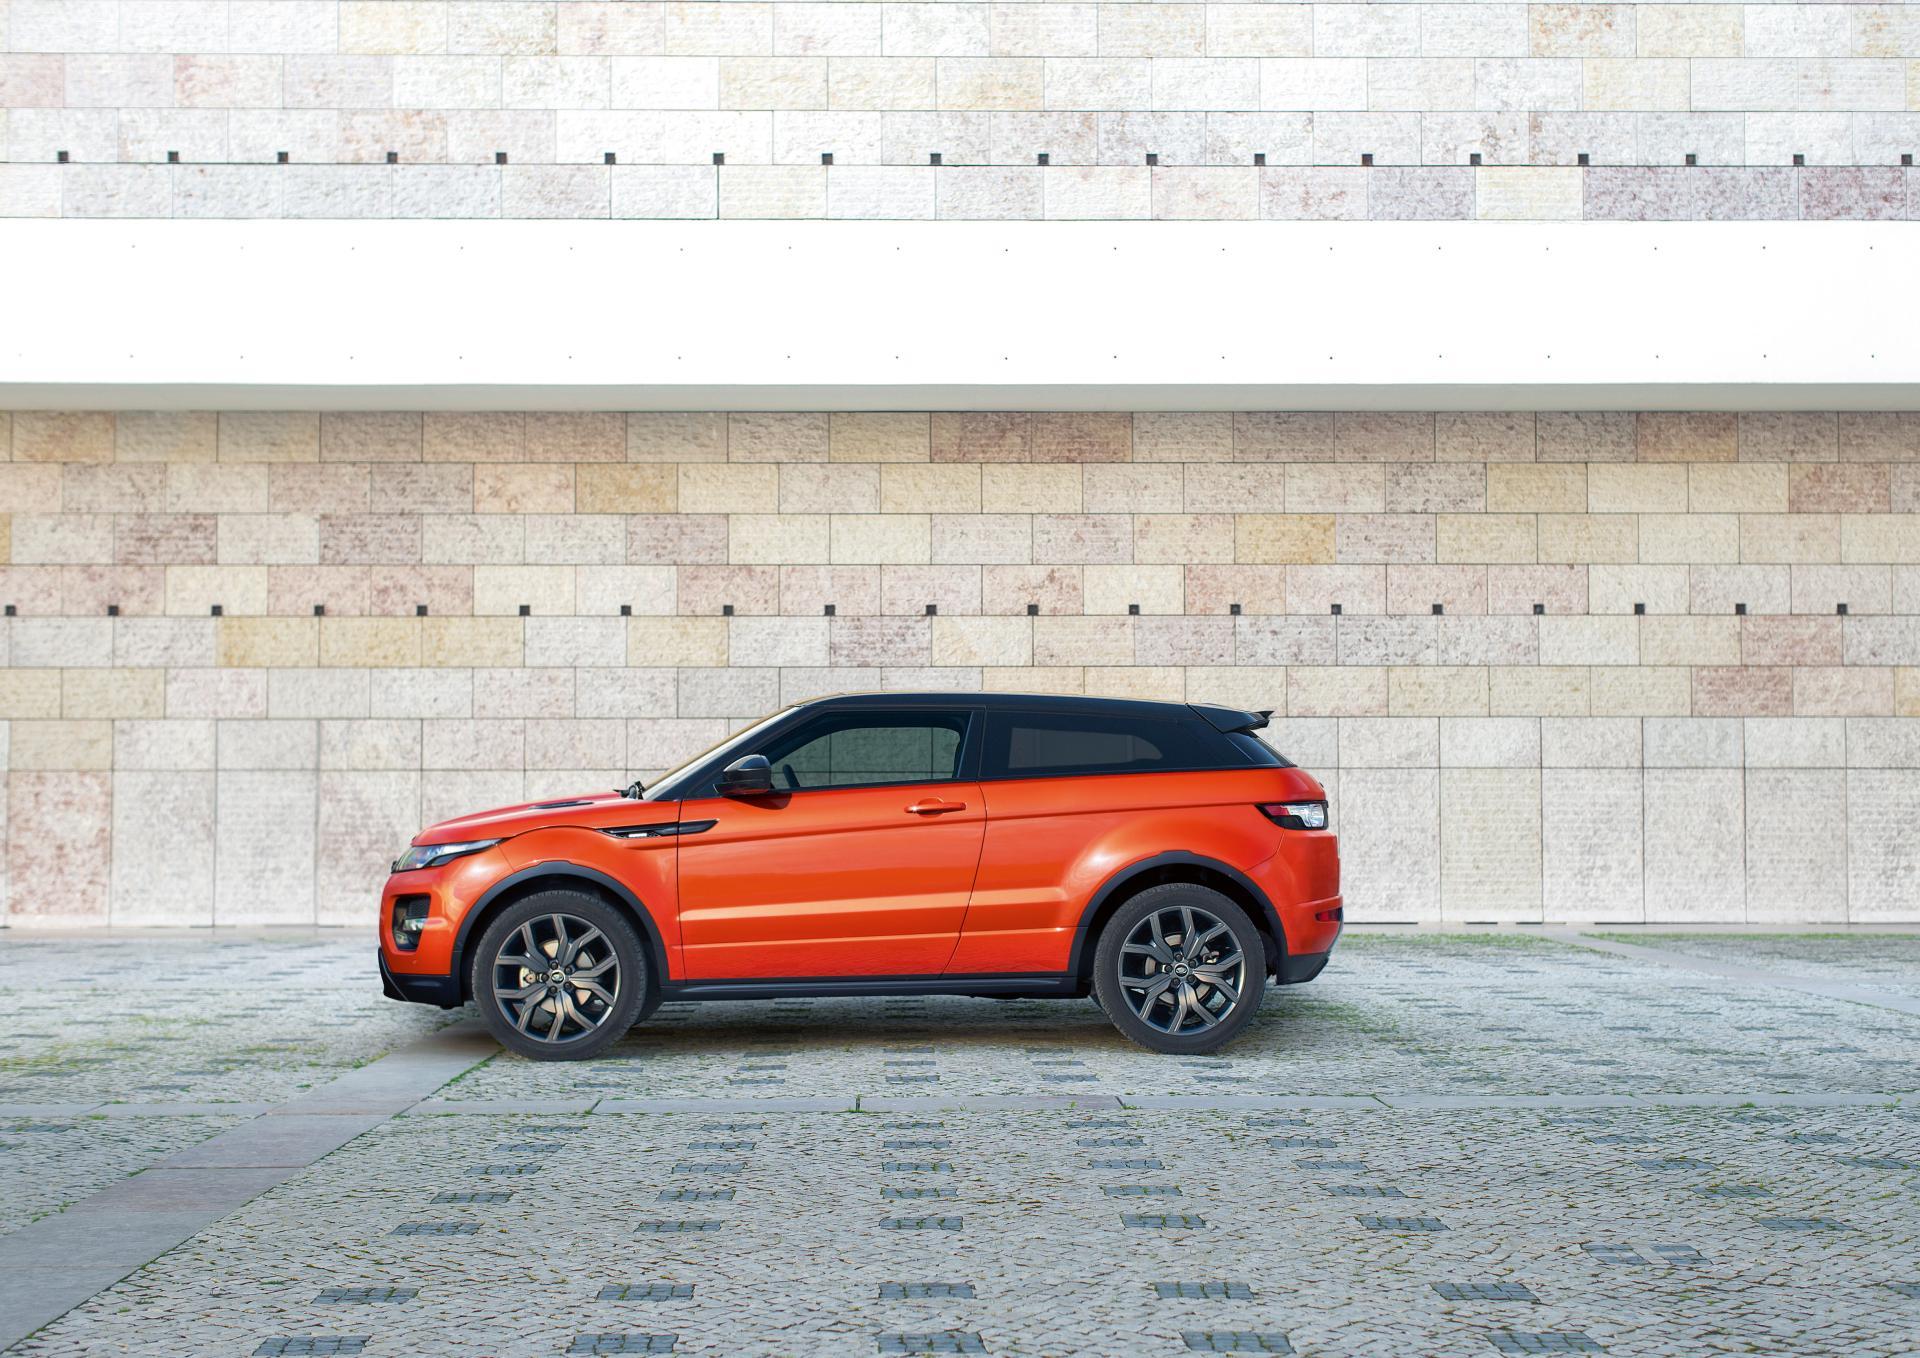 https://www.conceptcarz.com/images/Land%20Rover/2014-Range-Rover-Autobigoraphy-01.jpg